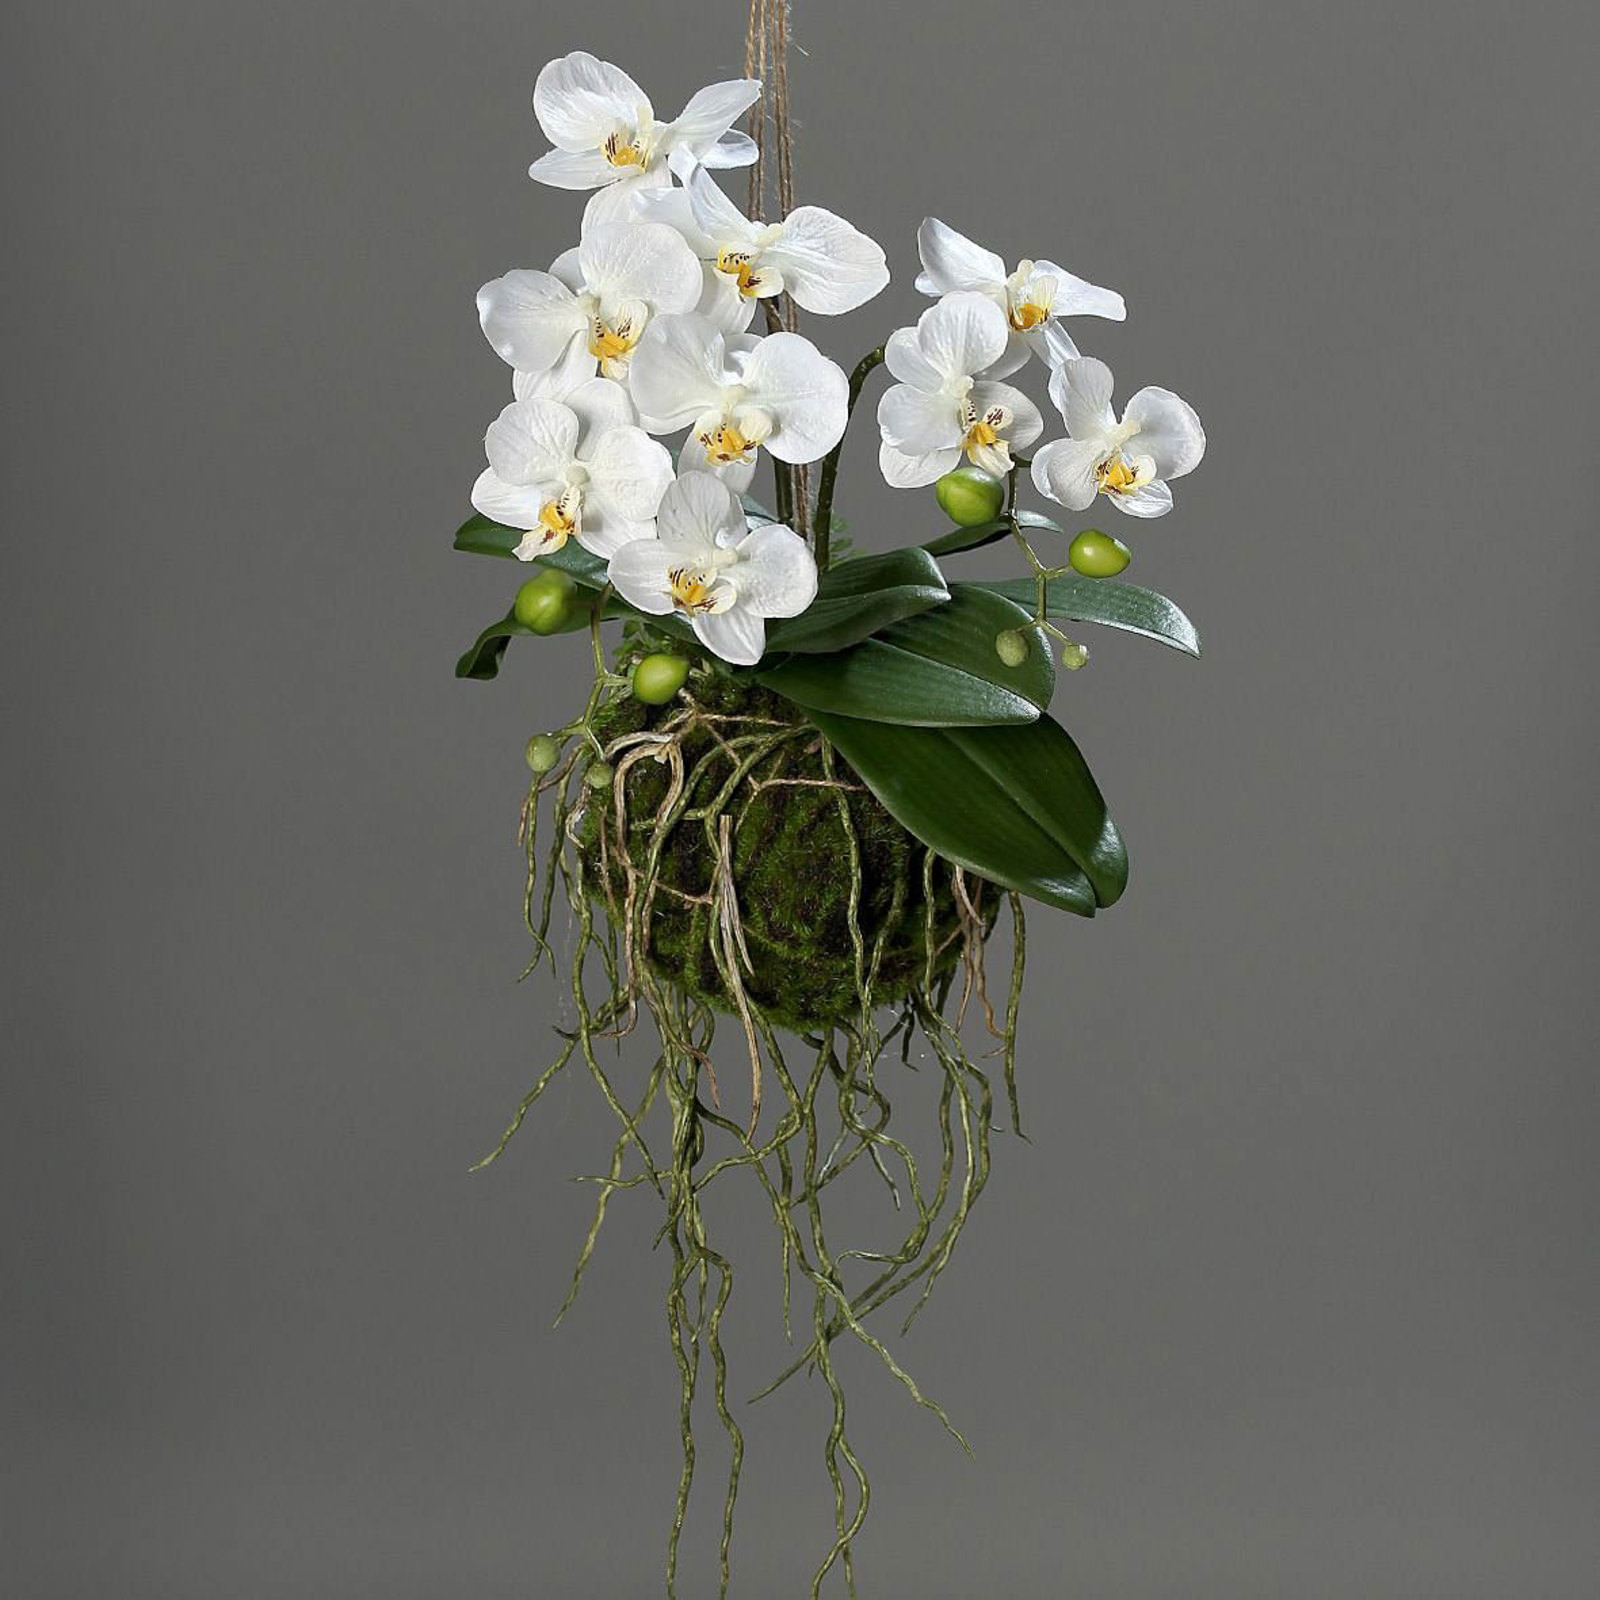 orchidee online entdecken knuffmann ihr m belhaus. Black Bedroom Furniture Sets. Home Design Ideas